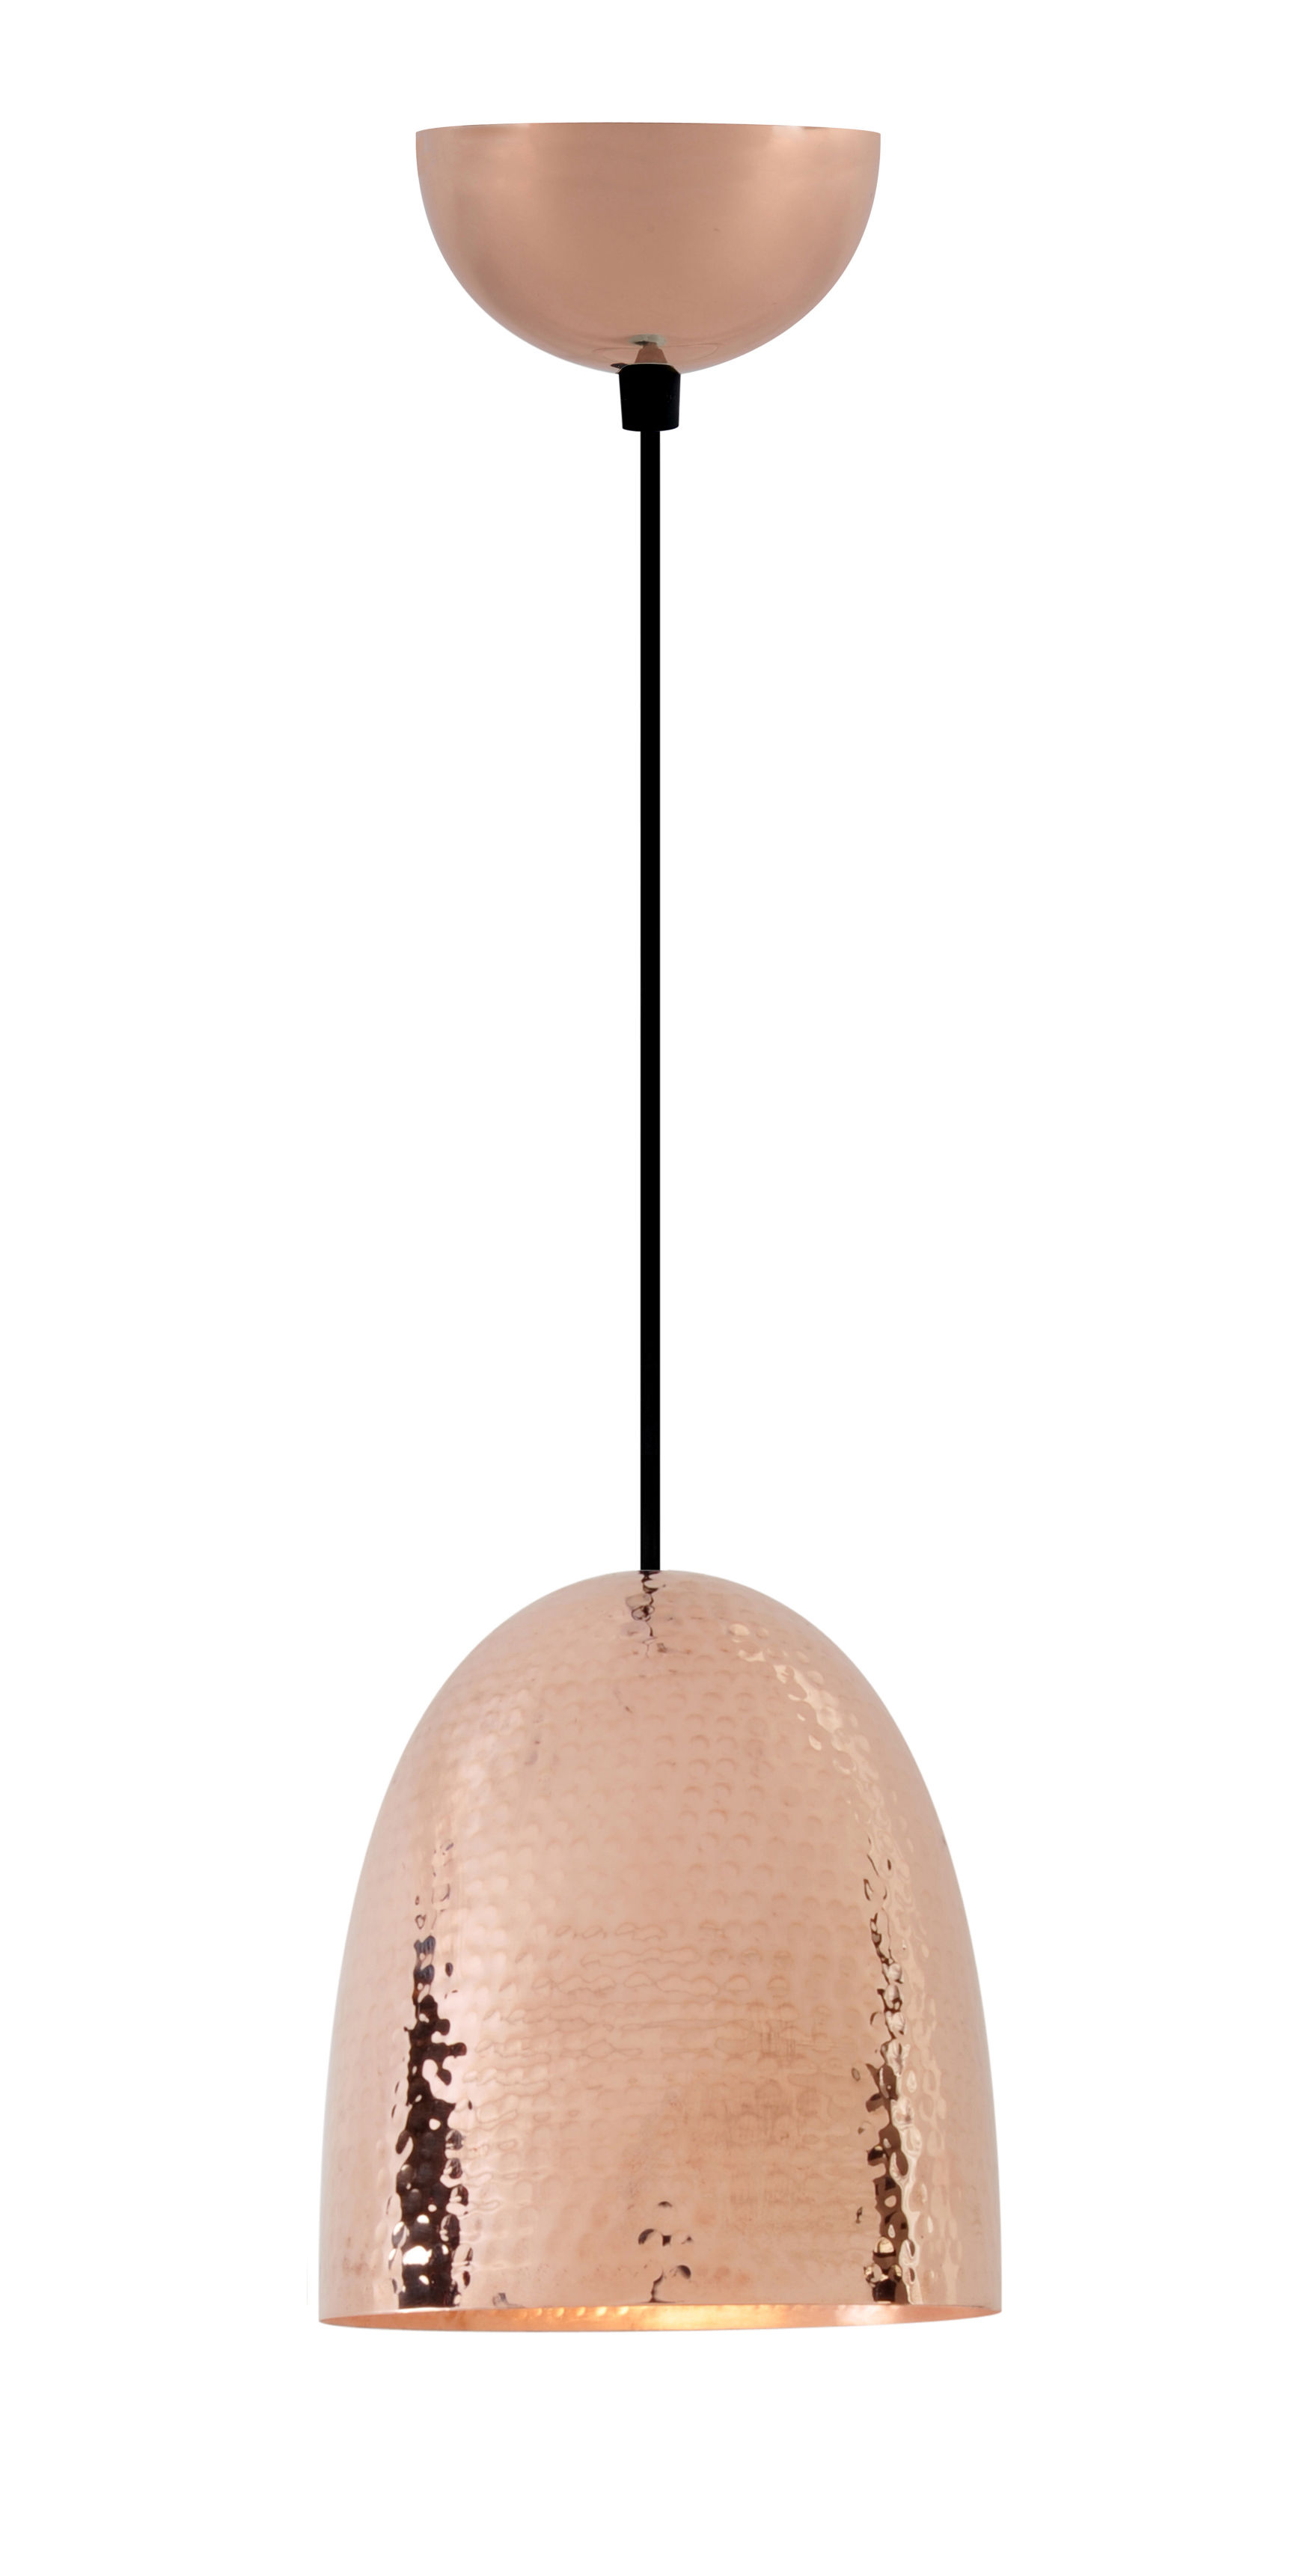 Luminaire - Suspensions - Suspension Stanley Small / Ø 18 x H 20 cm - Cuivre martelé - Original BTC - H 20 cm (Small) / Cuivre - Cuivre martelé